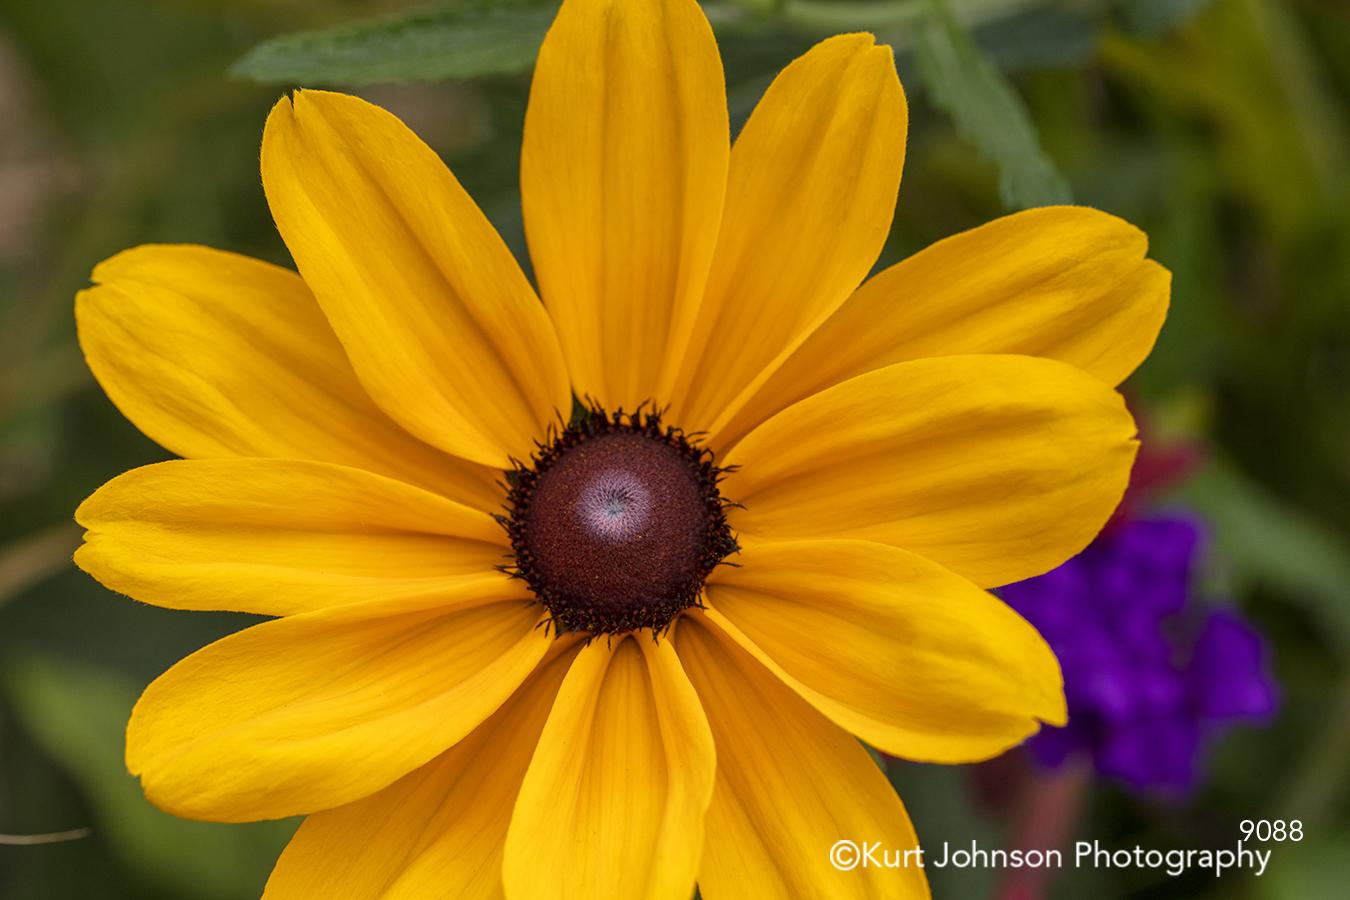 yellow flower detail close up petal petals modern bright happy